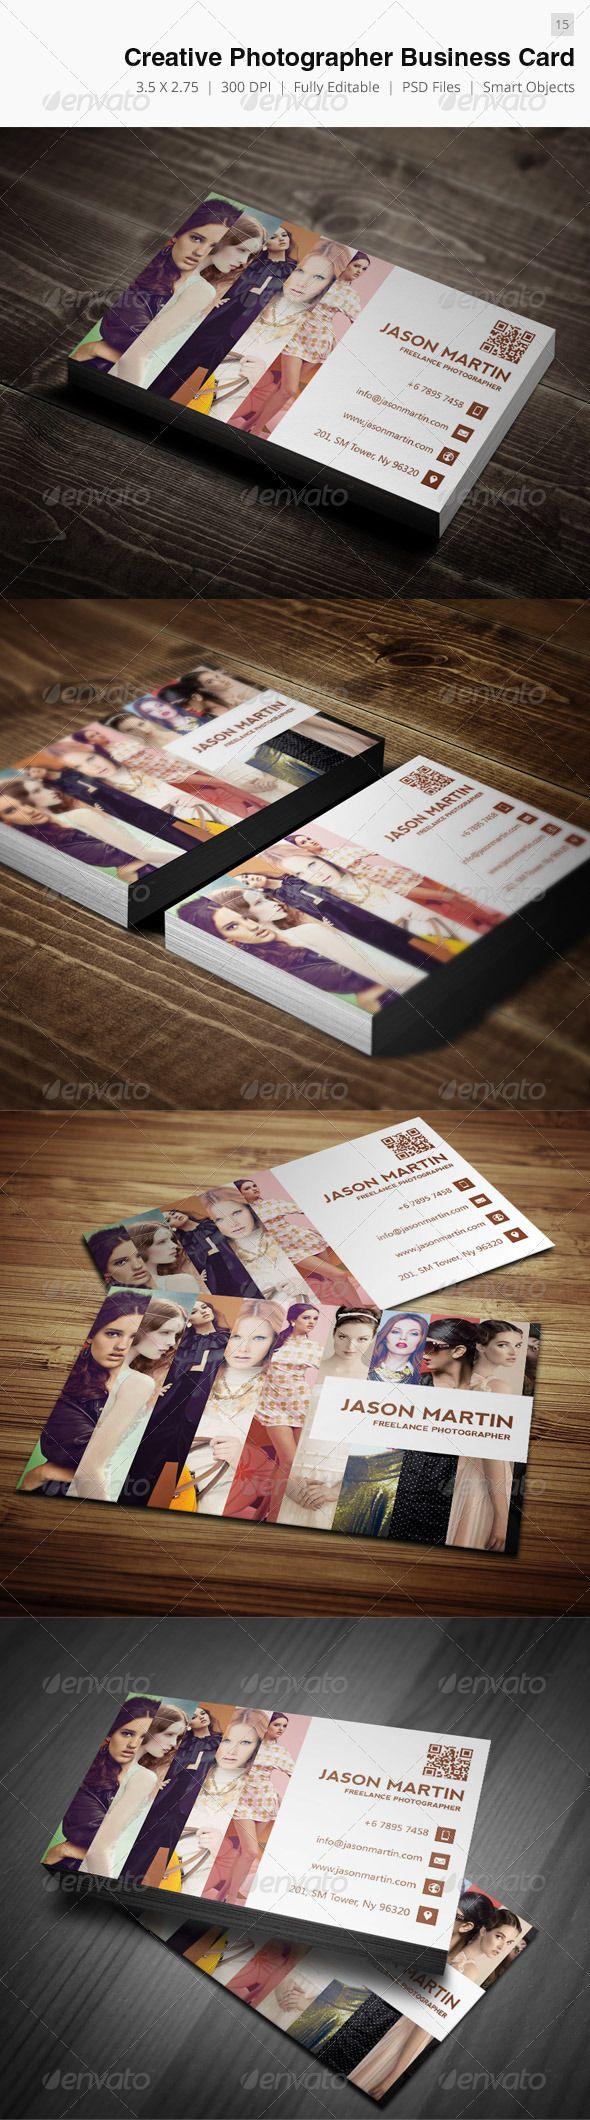 Creative Photographer Business Card - 15 | Photographer business ...